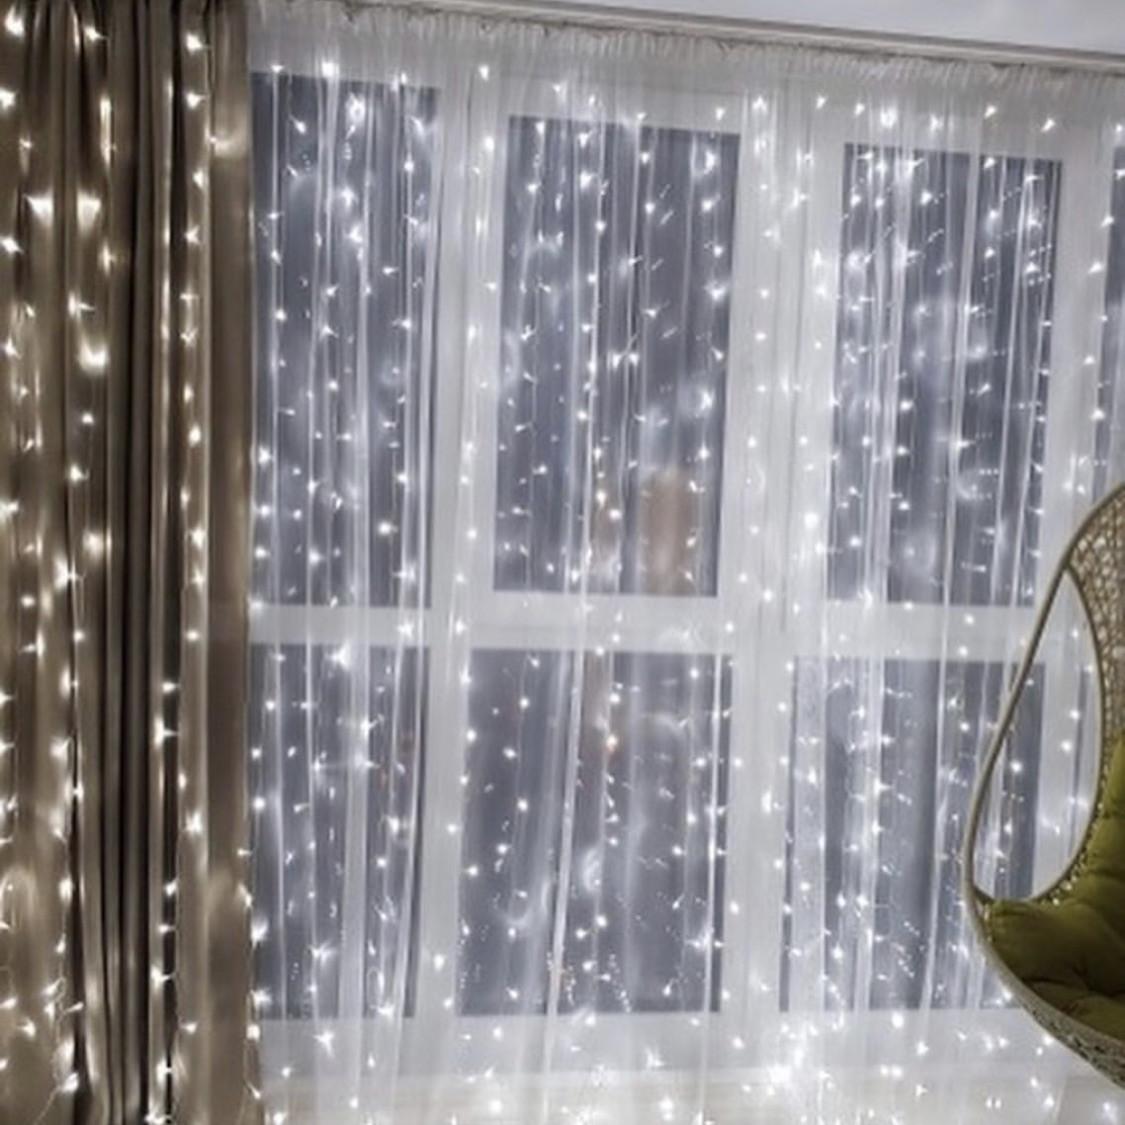 Гирлянда Водопад 3 м х 2,5 м, 720 LED (Штора, Занавес, Curtain lights)